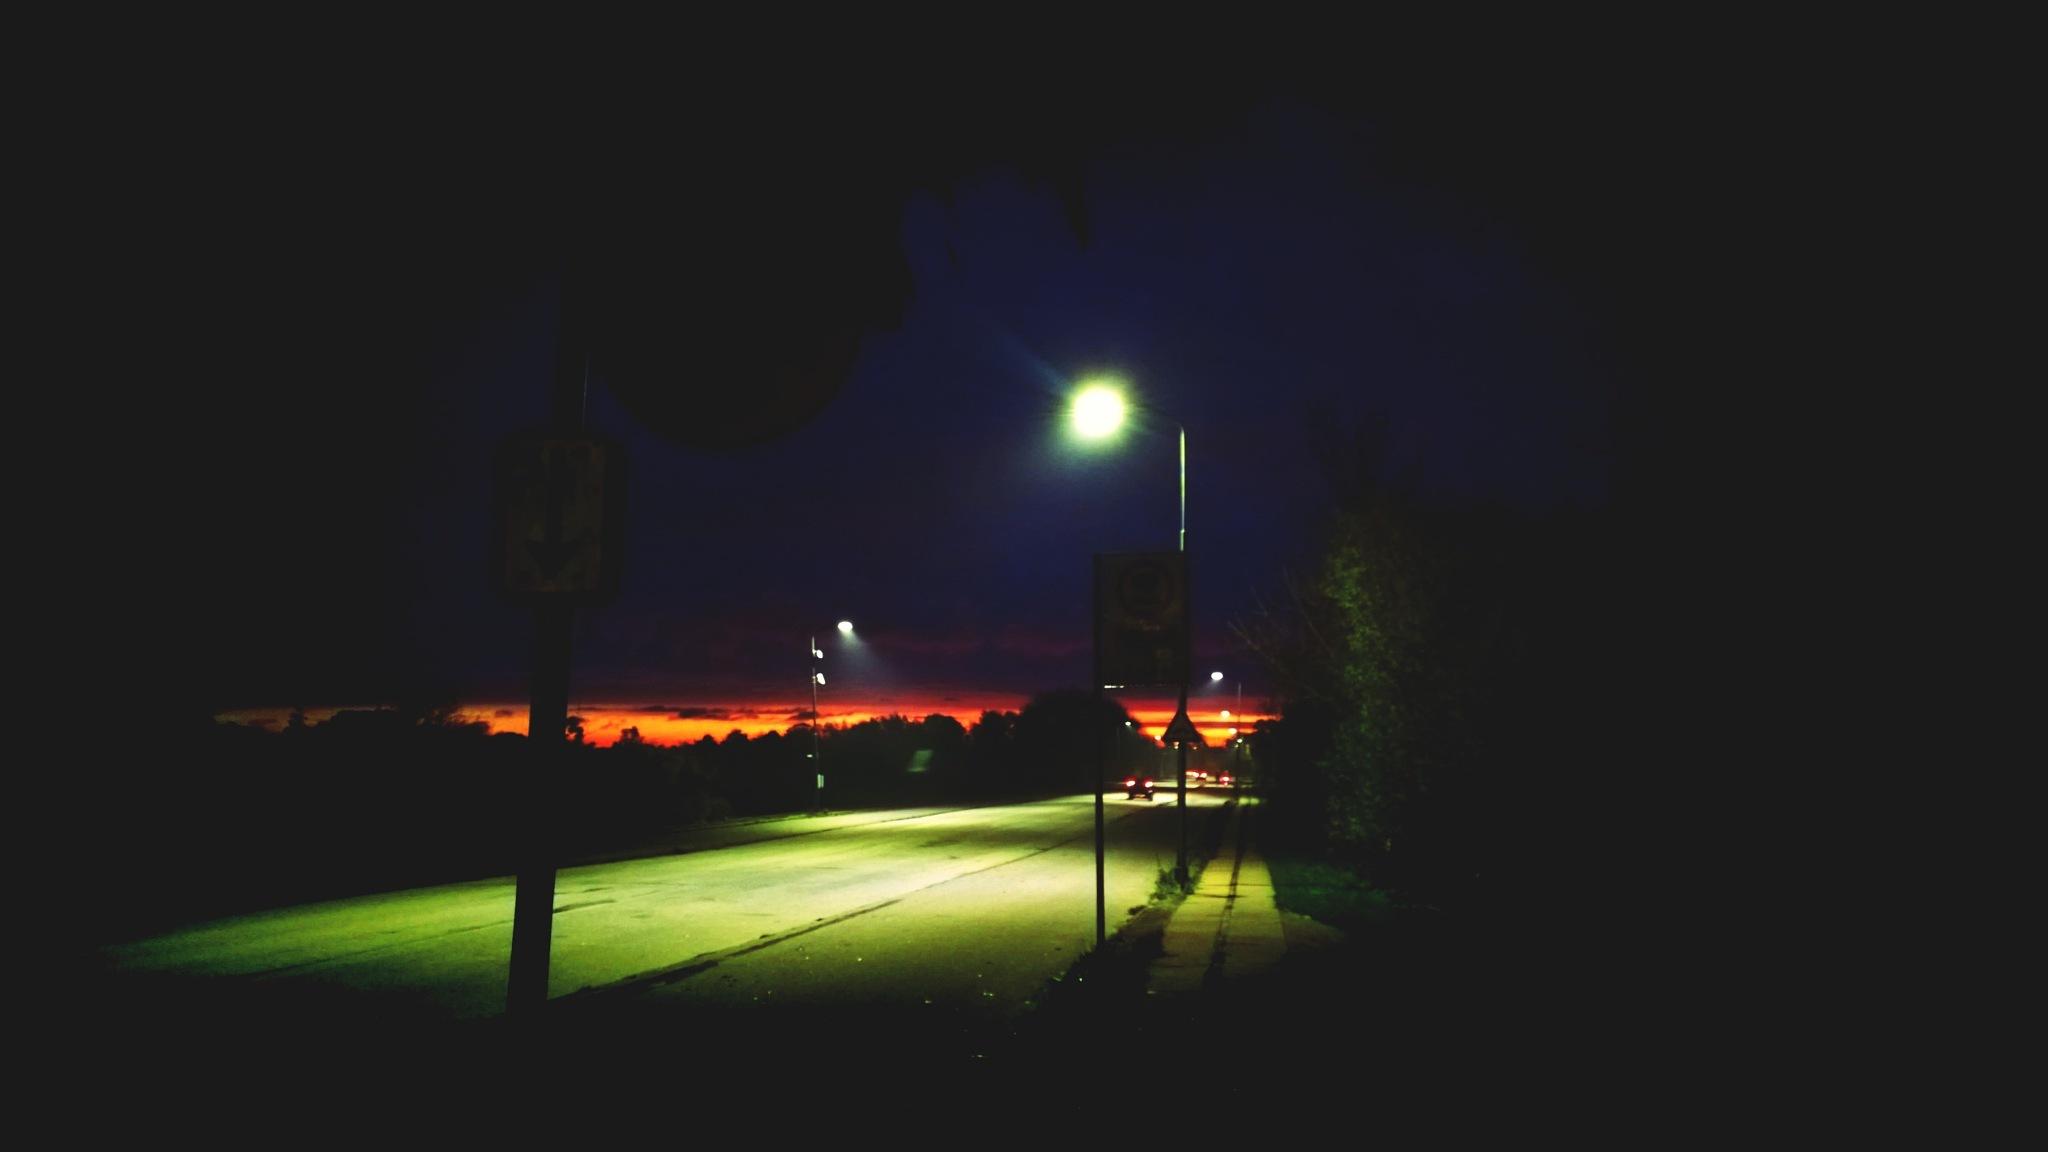 morning walk by Terry Dunn